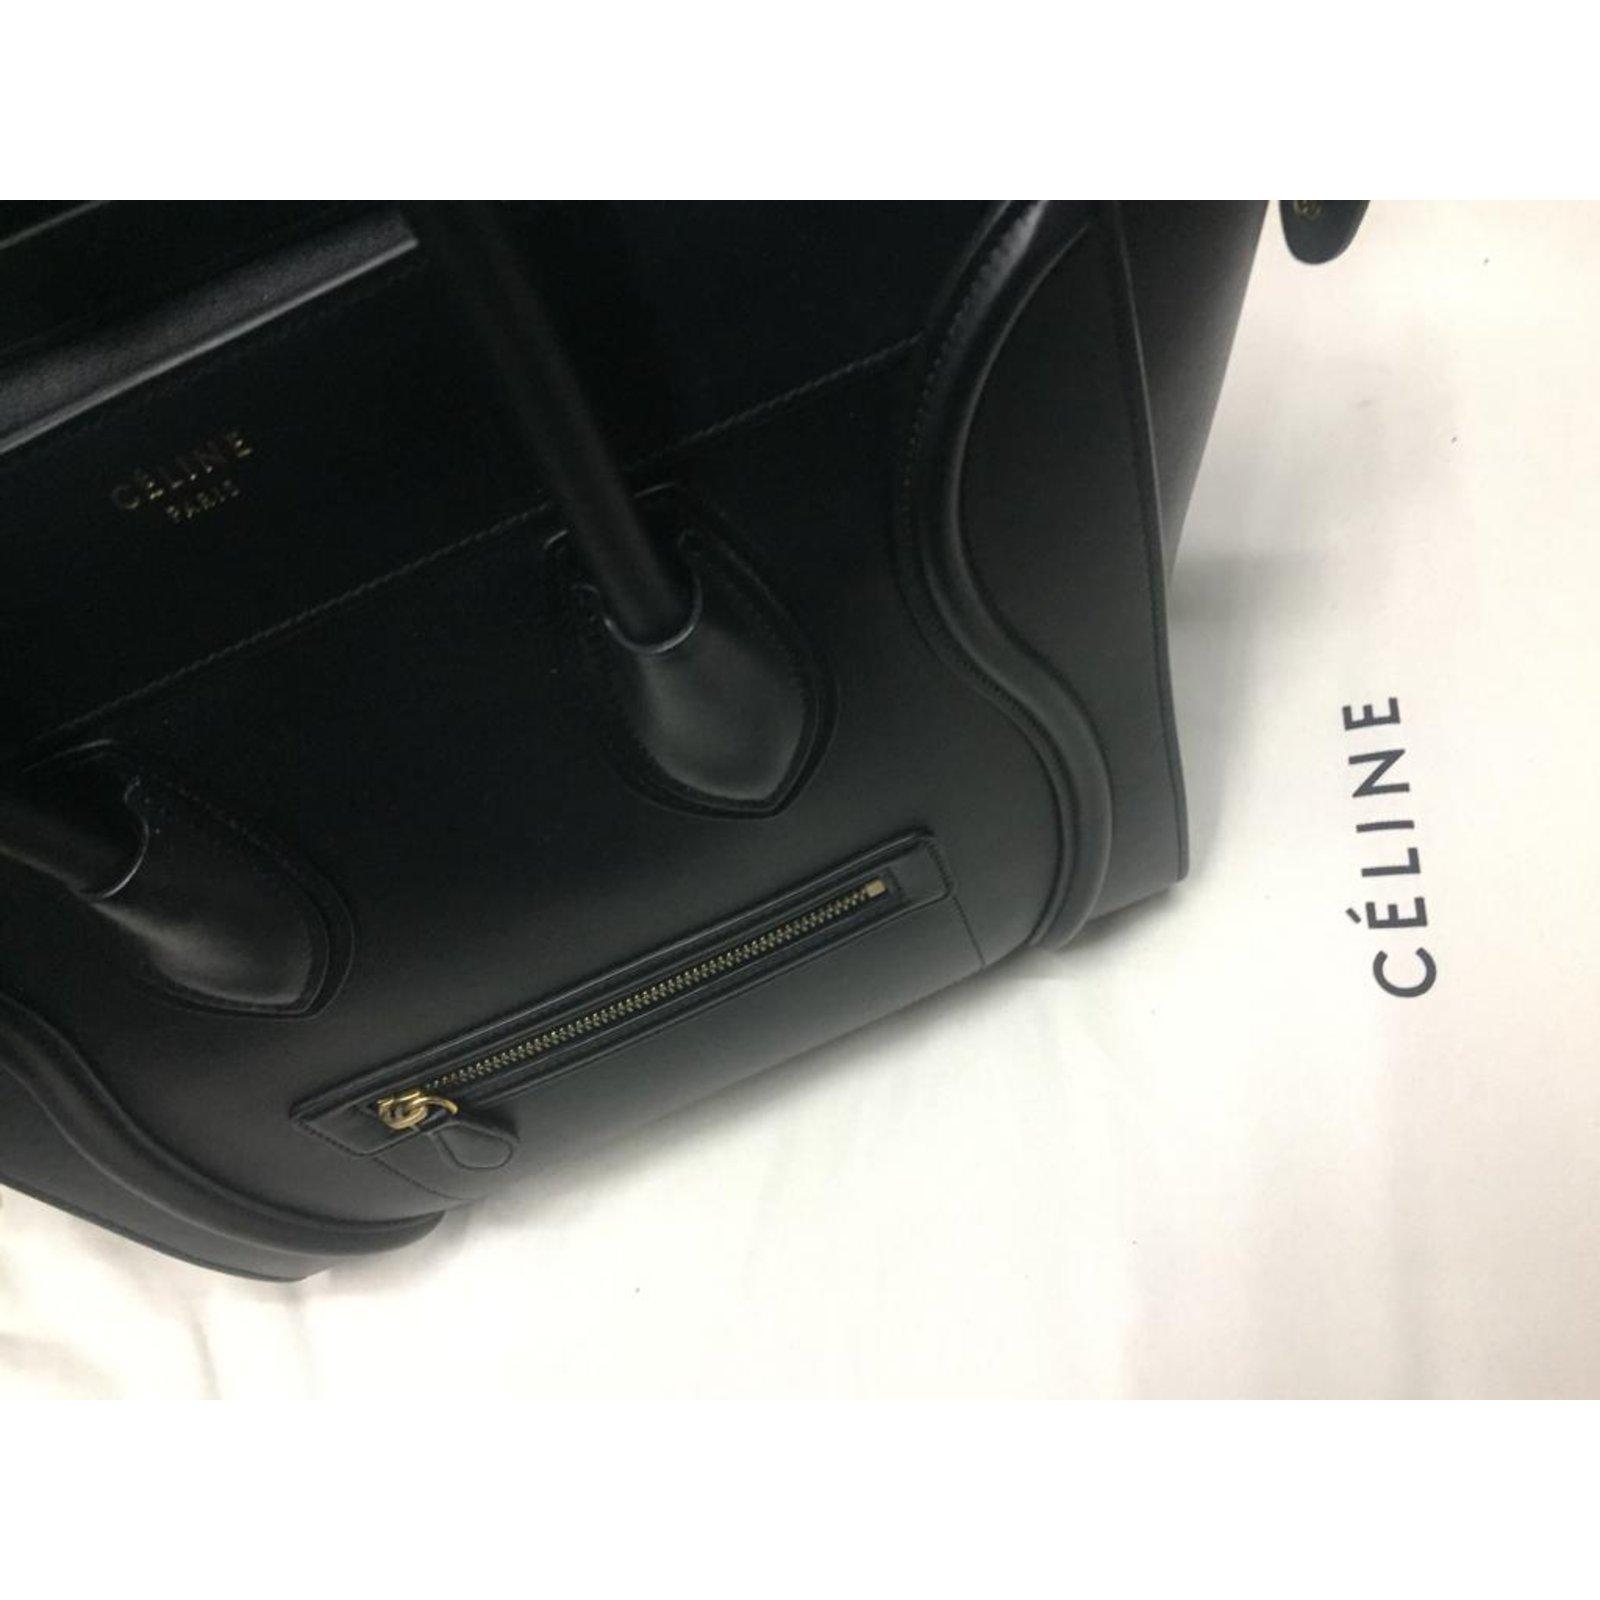 78667ec61d Céline CELINE MINI LUGGAGE SAC BREND NEW BLACK Handbags Leather Black ref.101298  - Joli Closet